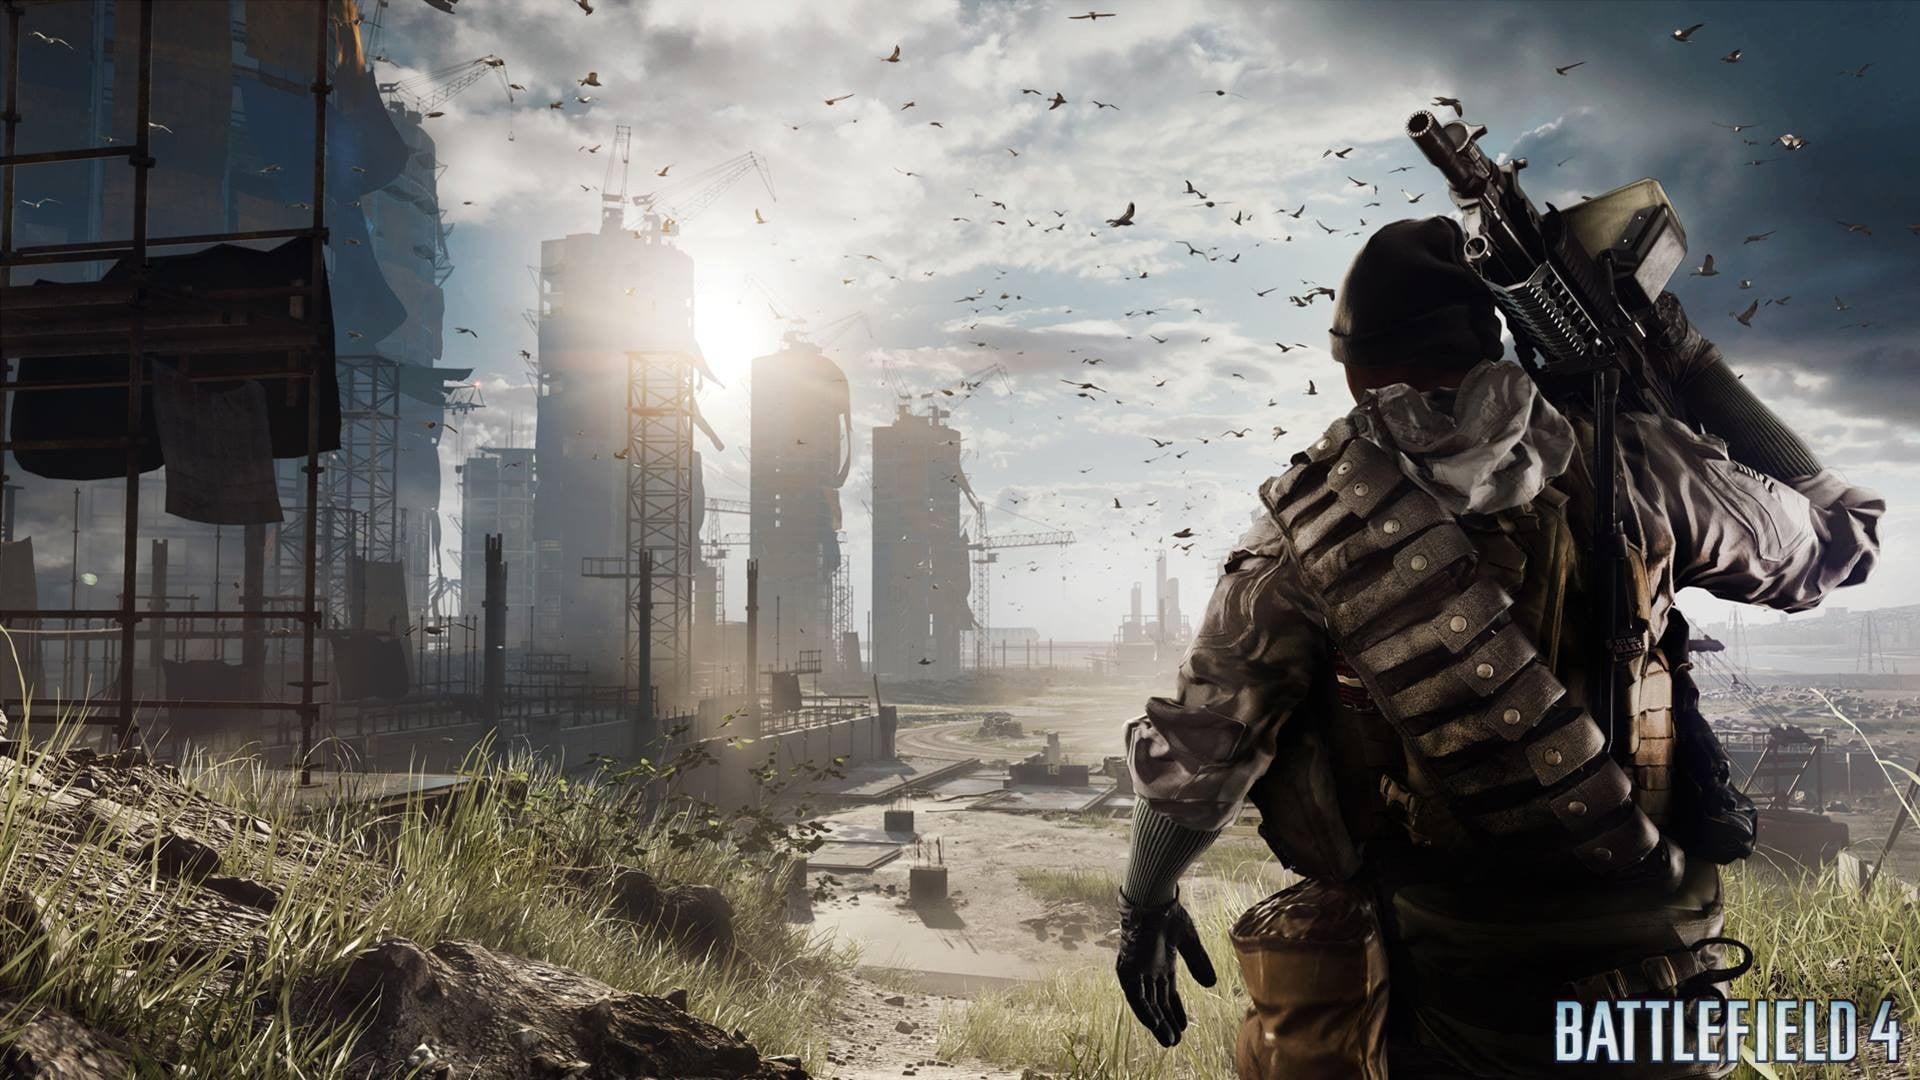 Battlefield 4 Wallpaper Hd - HD Wallpaper